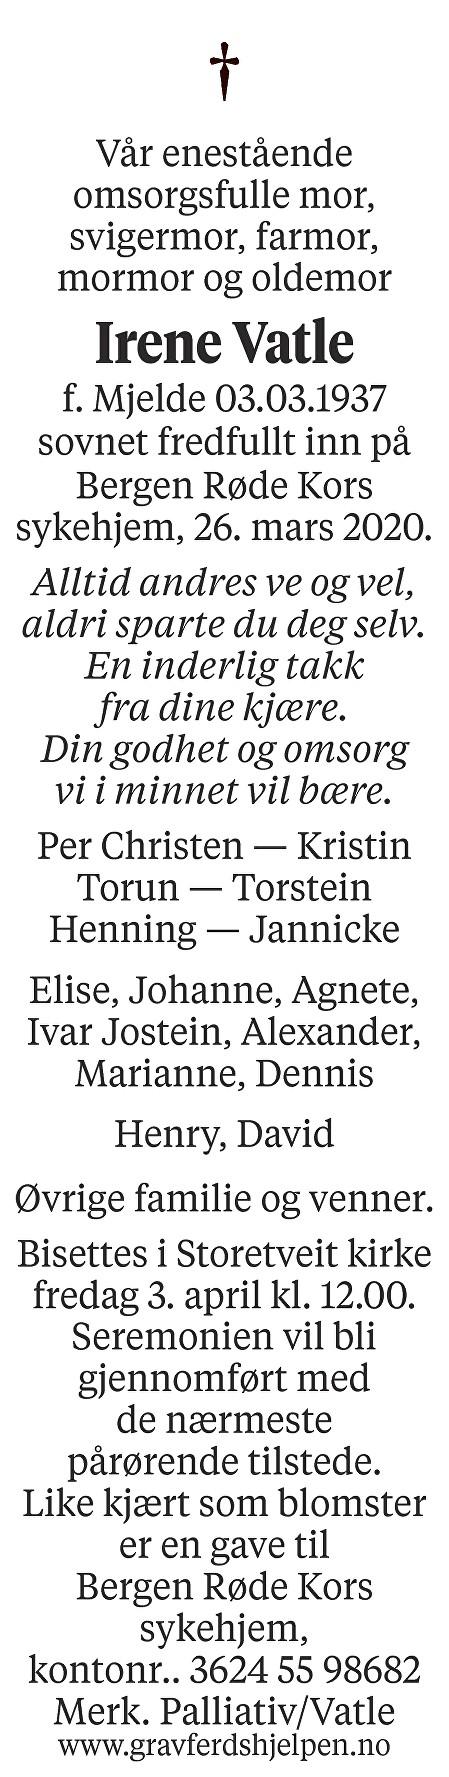 Irene Vatle Dødsannonse